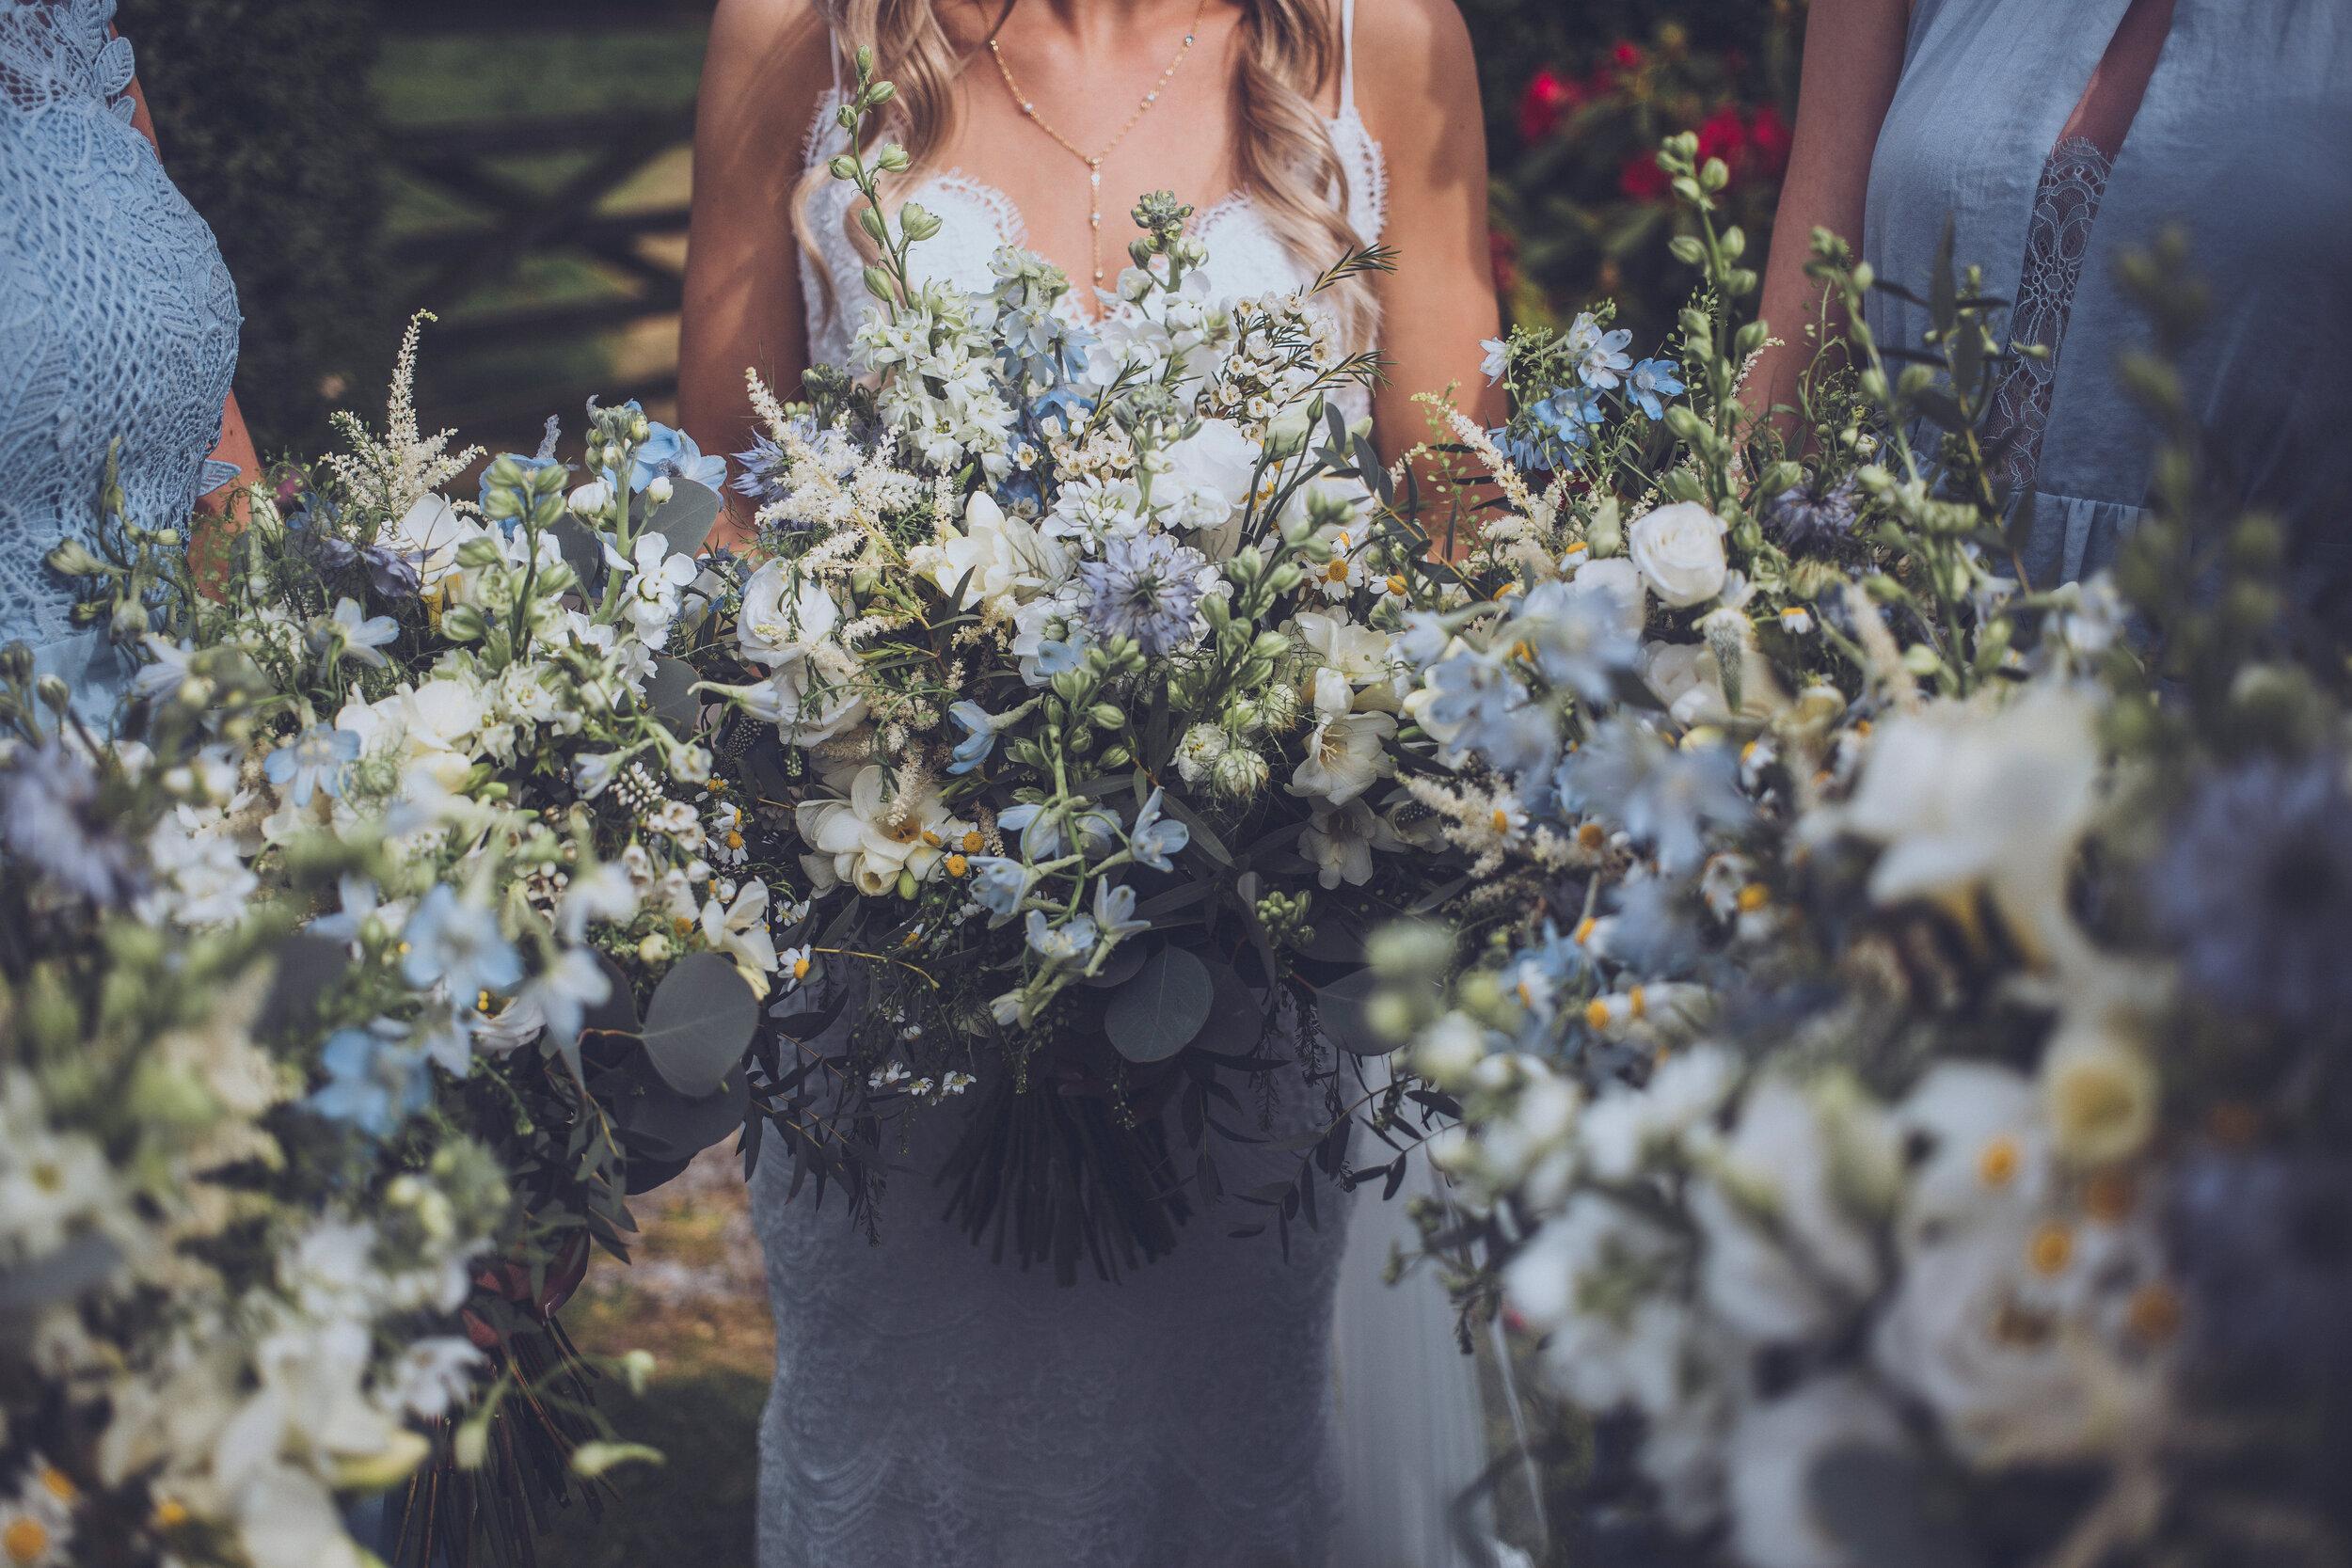 Dalduff Farm Ayrshire Wedding Photography - Claire Basiuk Photographer - 17.jpg